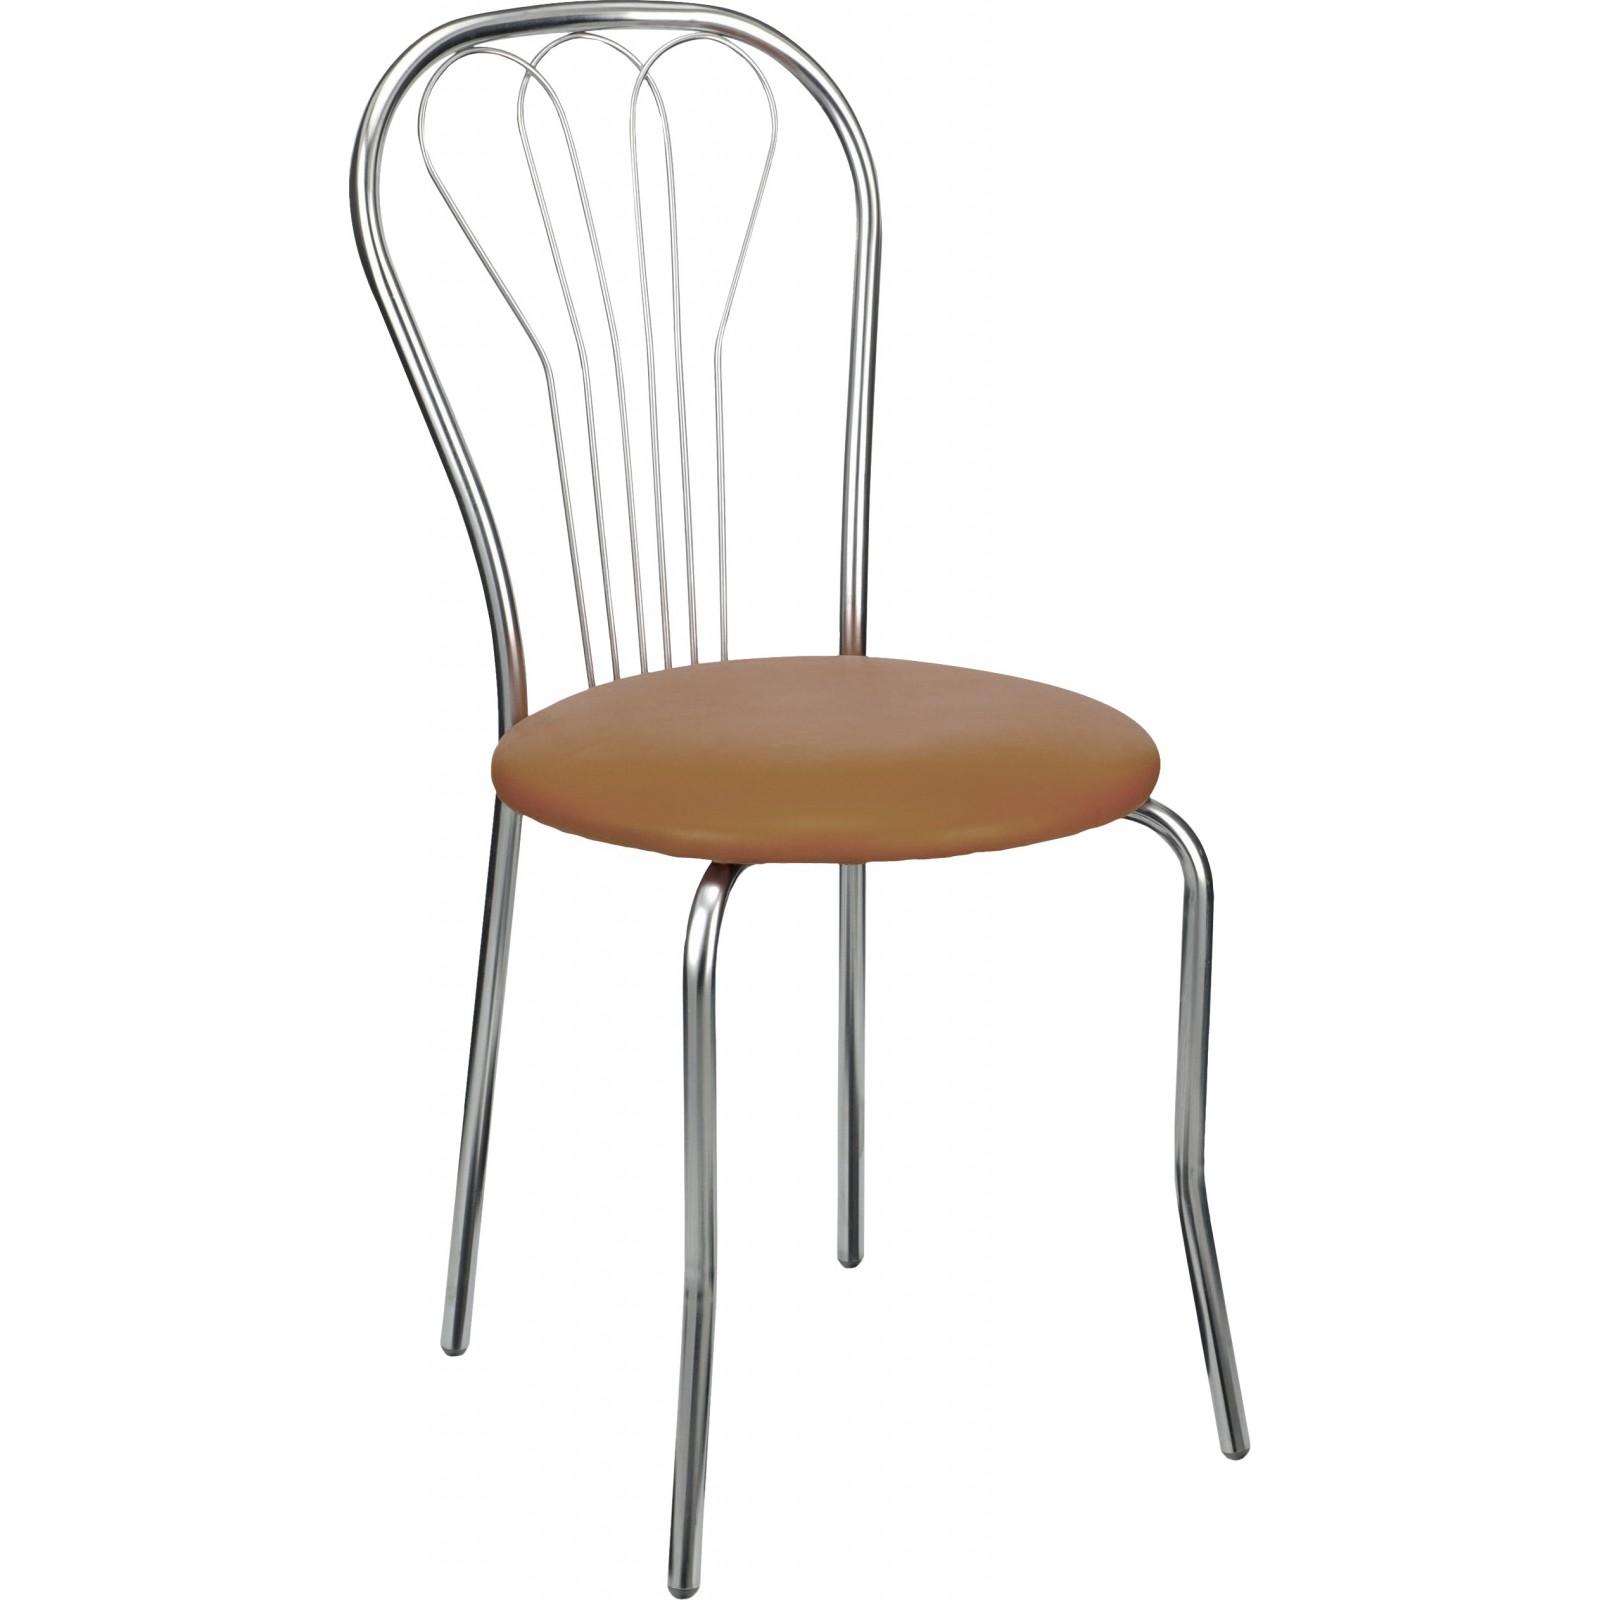 art metal furniture (amf) AMF Ванесса хром Неаполь N-16 (29843)